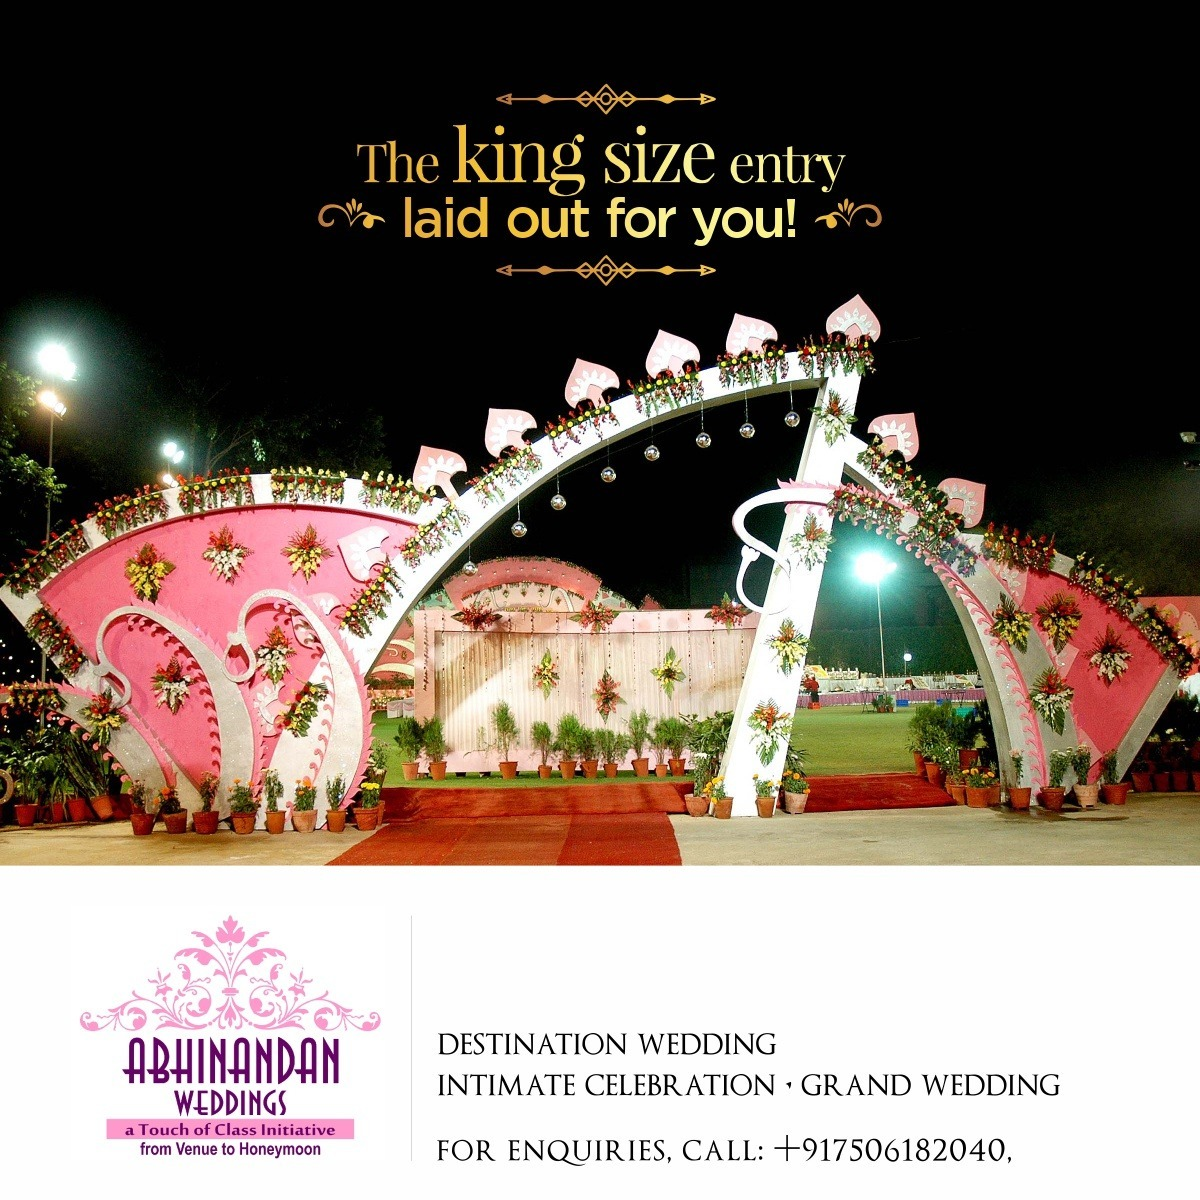 Mark a royal entry at your wedding! We arrange huge entry gates, well decorated and lit to add glitters at your event.  #abhinandanweddings #mumbaiwedding #delhiwedding #punewedding #weddinggoa #weddingbanglore #weddingkolkata #wedding #dreamwedding #plan #shadi